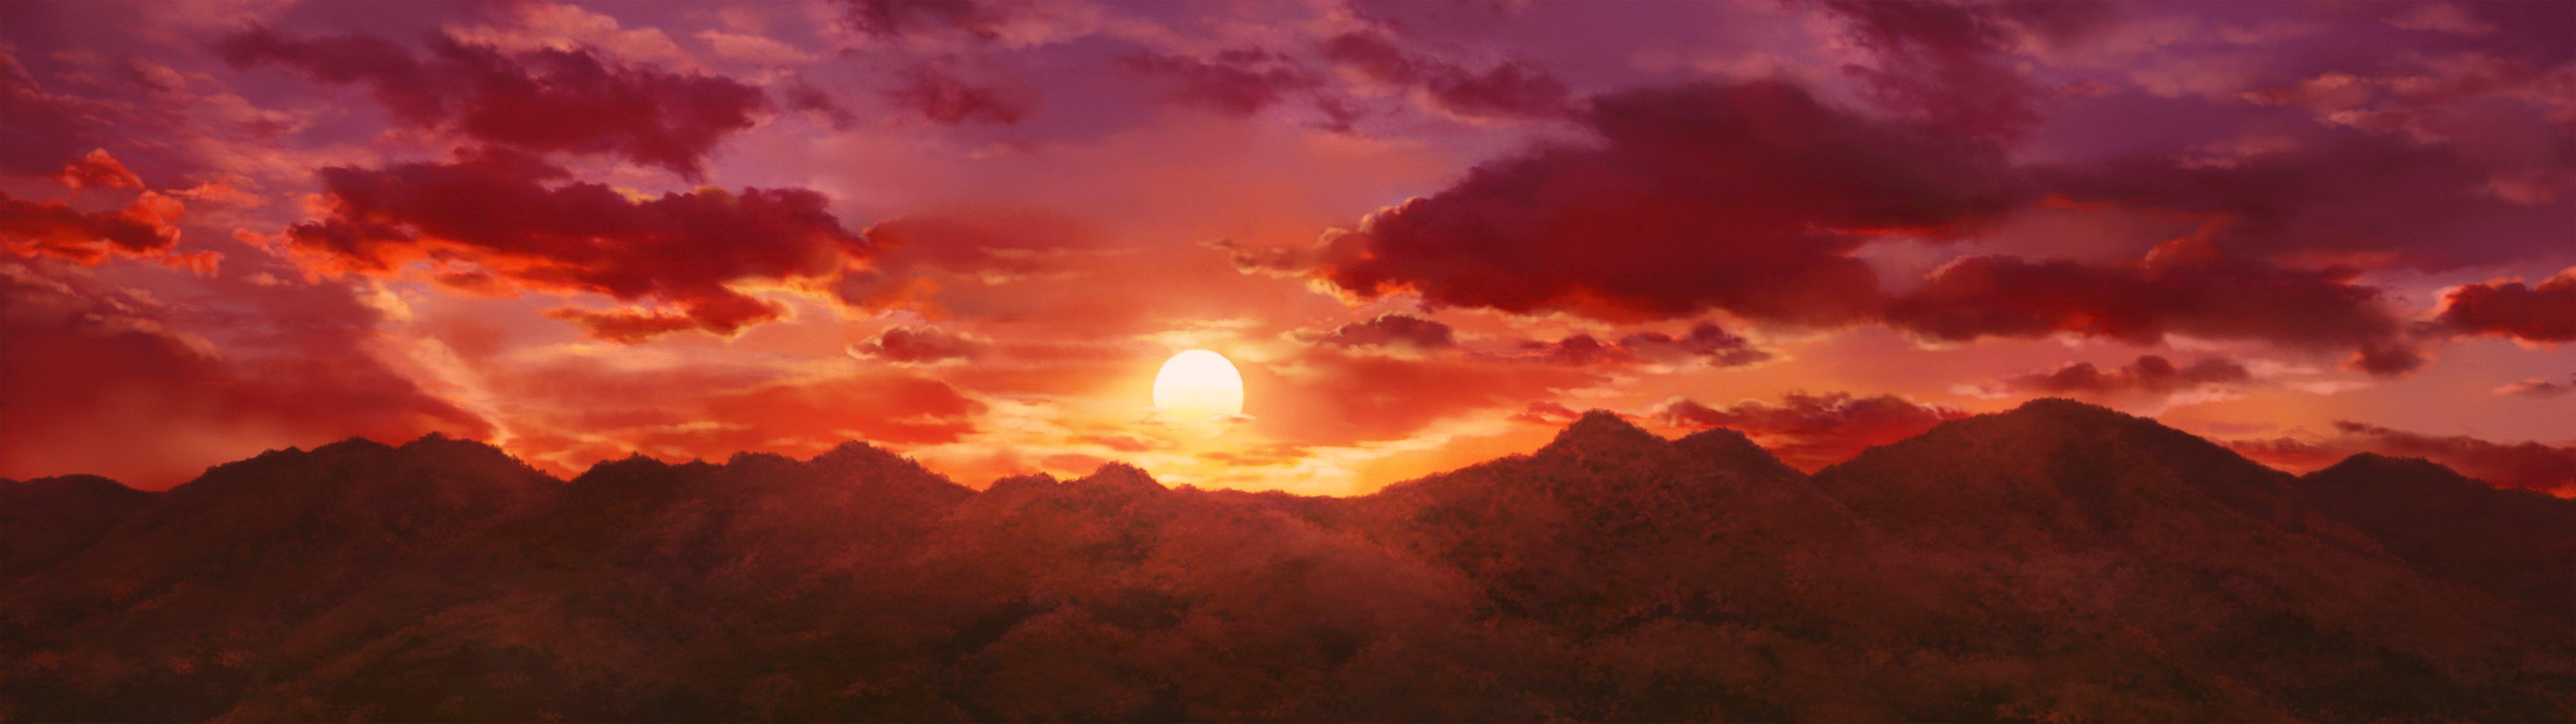 Monobeno-cura-highres-wide+image-cloud+(clouds)-sky